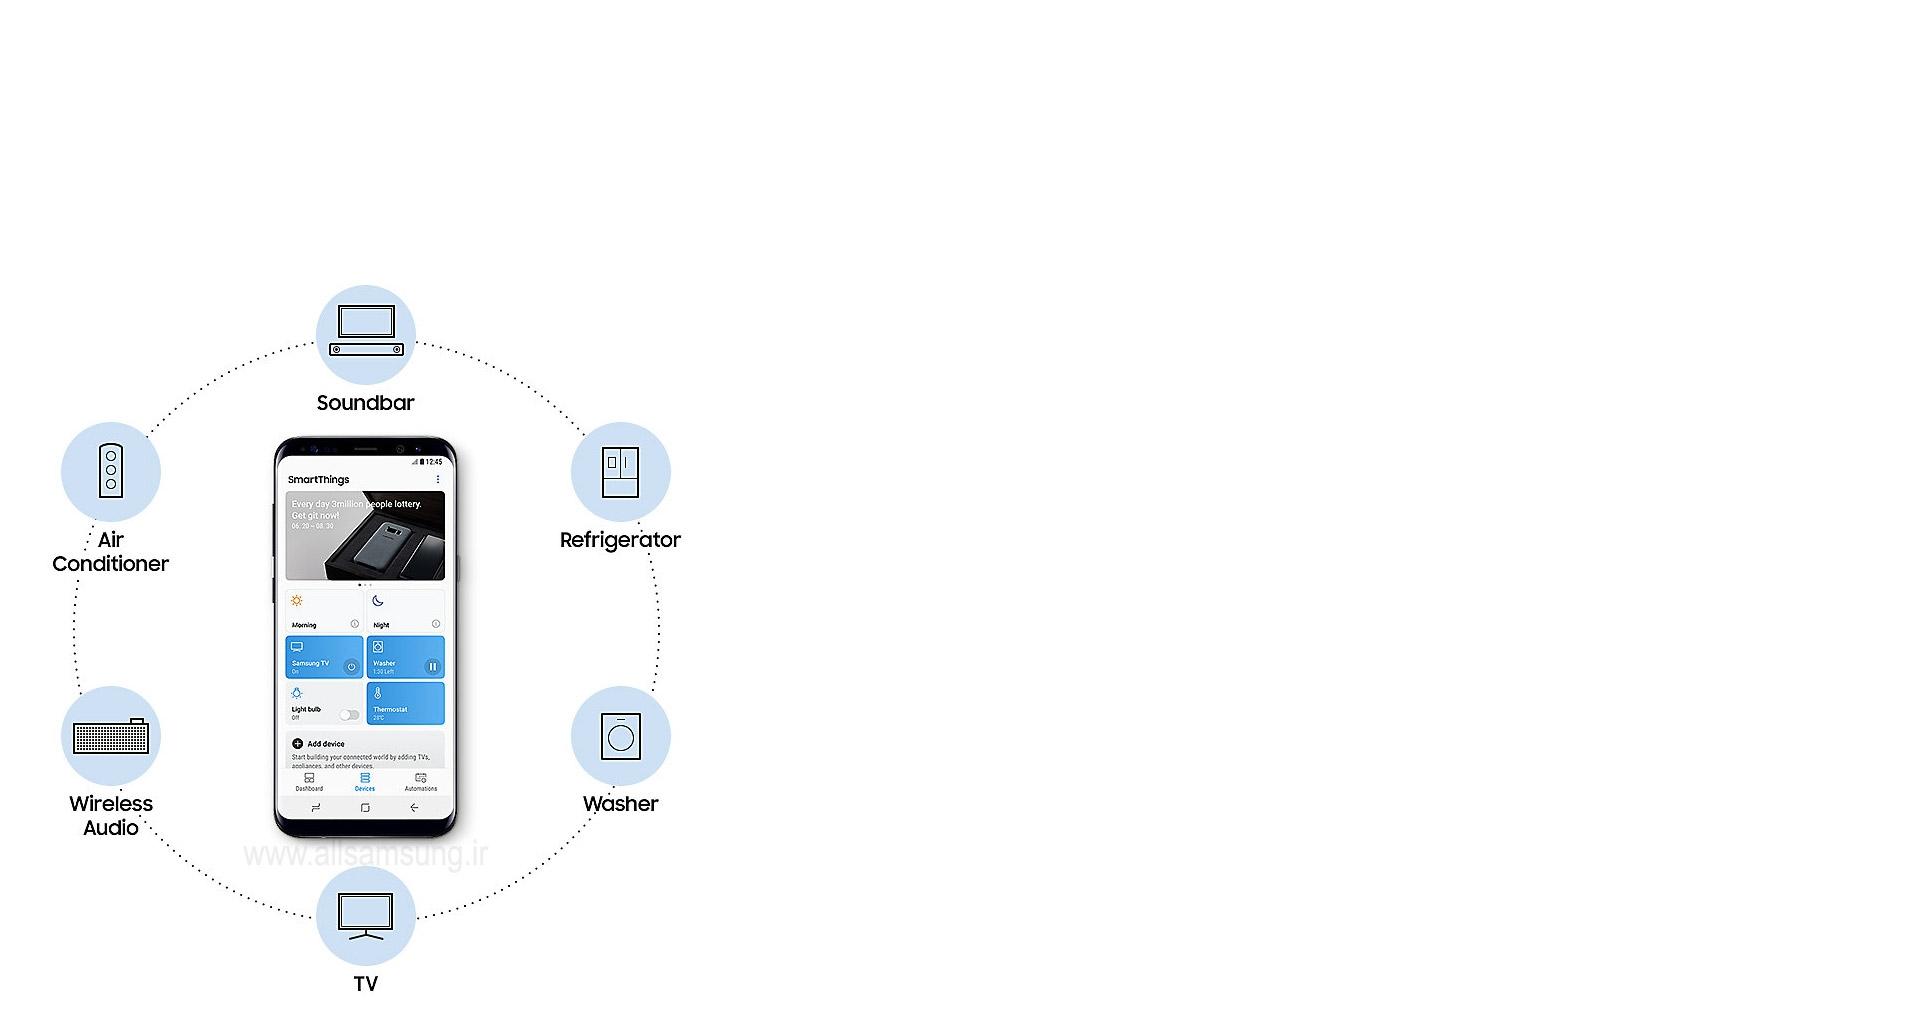 کنترل هوشمند لوازم خانگی با ساندبار N950